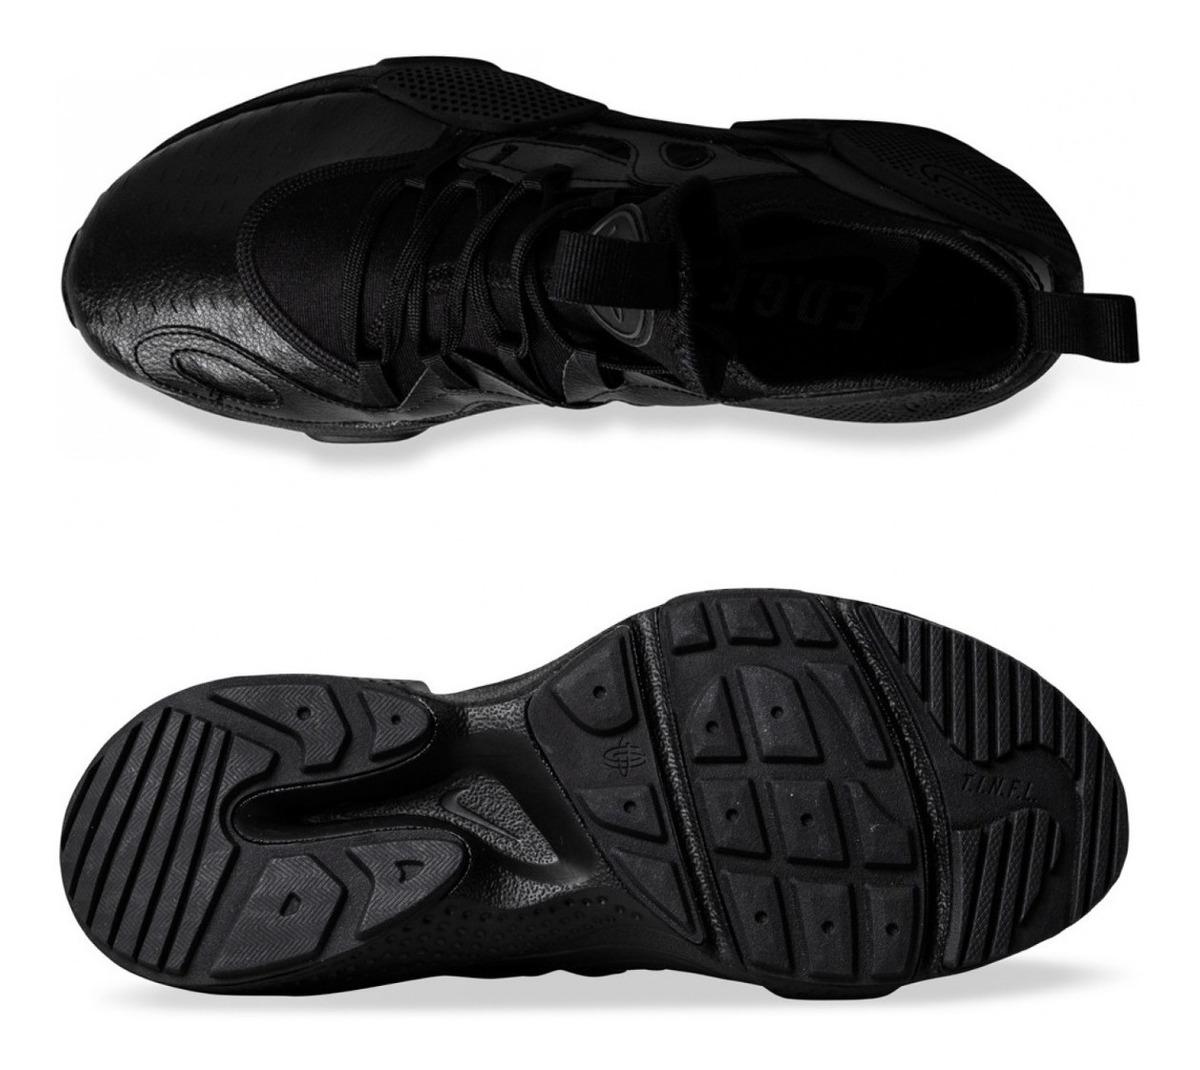 Irradiar Imperial ejemplo  Zapatilla Nike Huarache Edge Para Hombre - 2 Colores/ Oferta - S ...